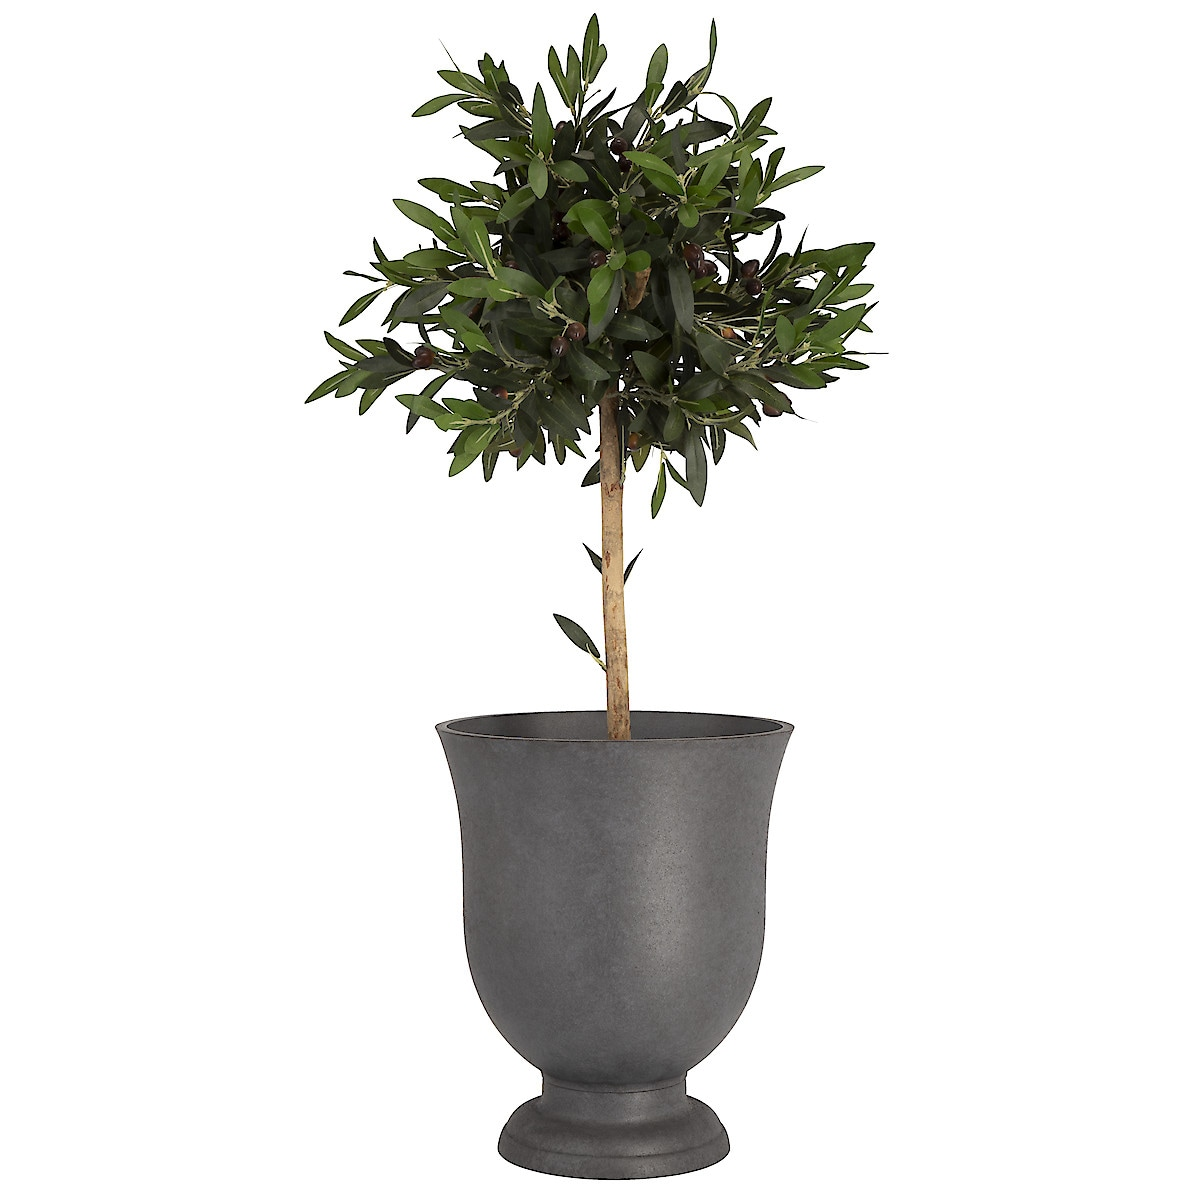 Blomkruka urna, Ø 35 cm